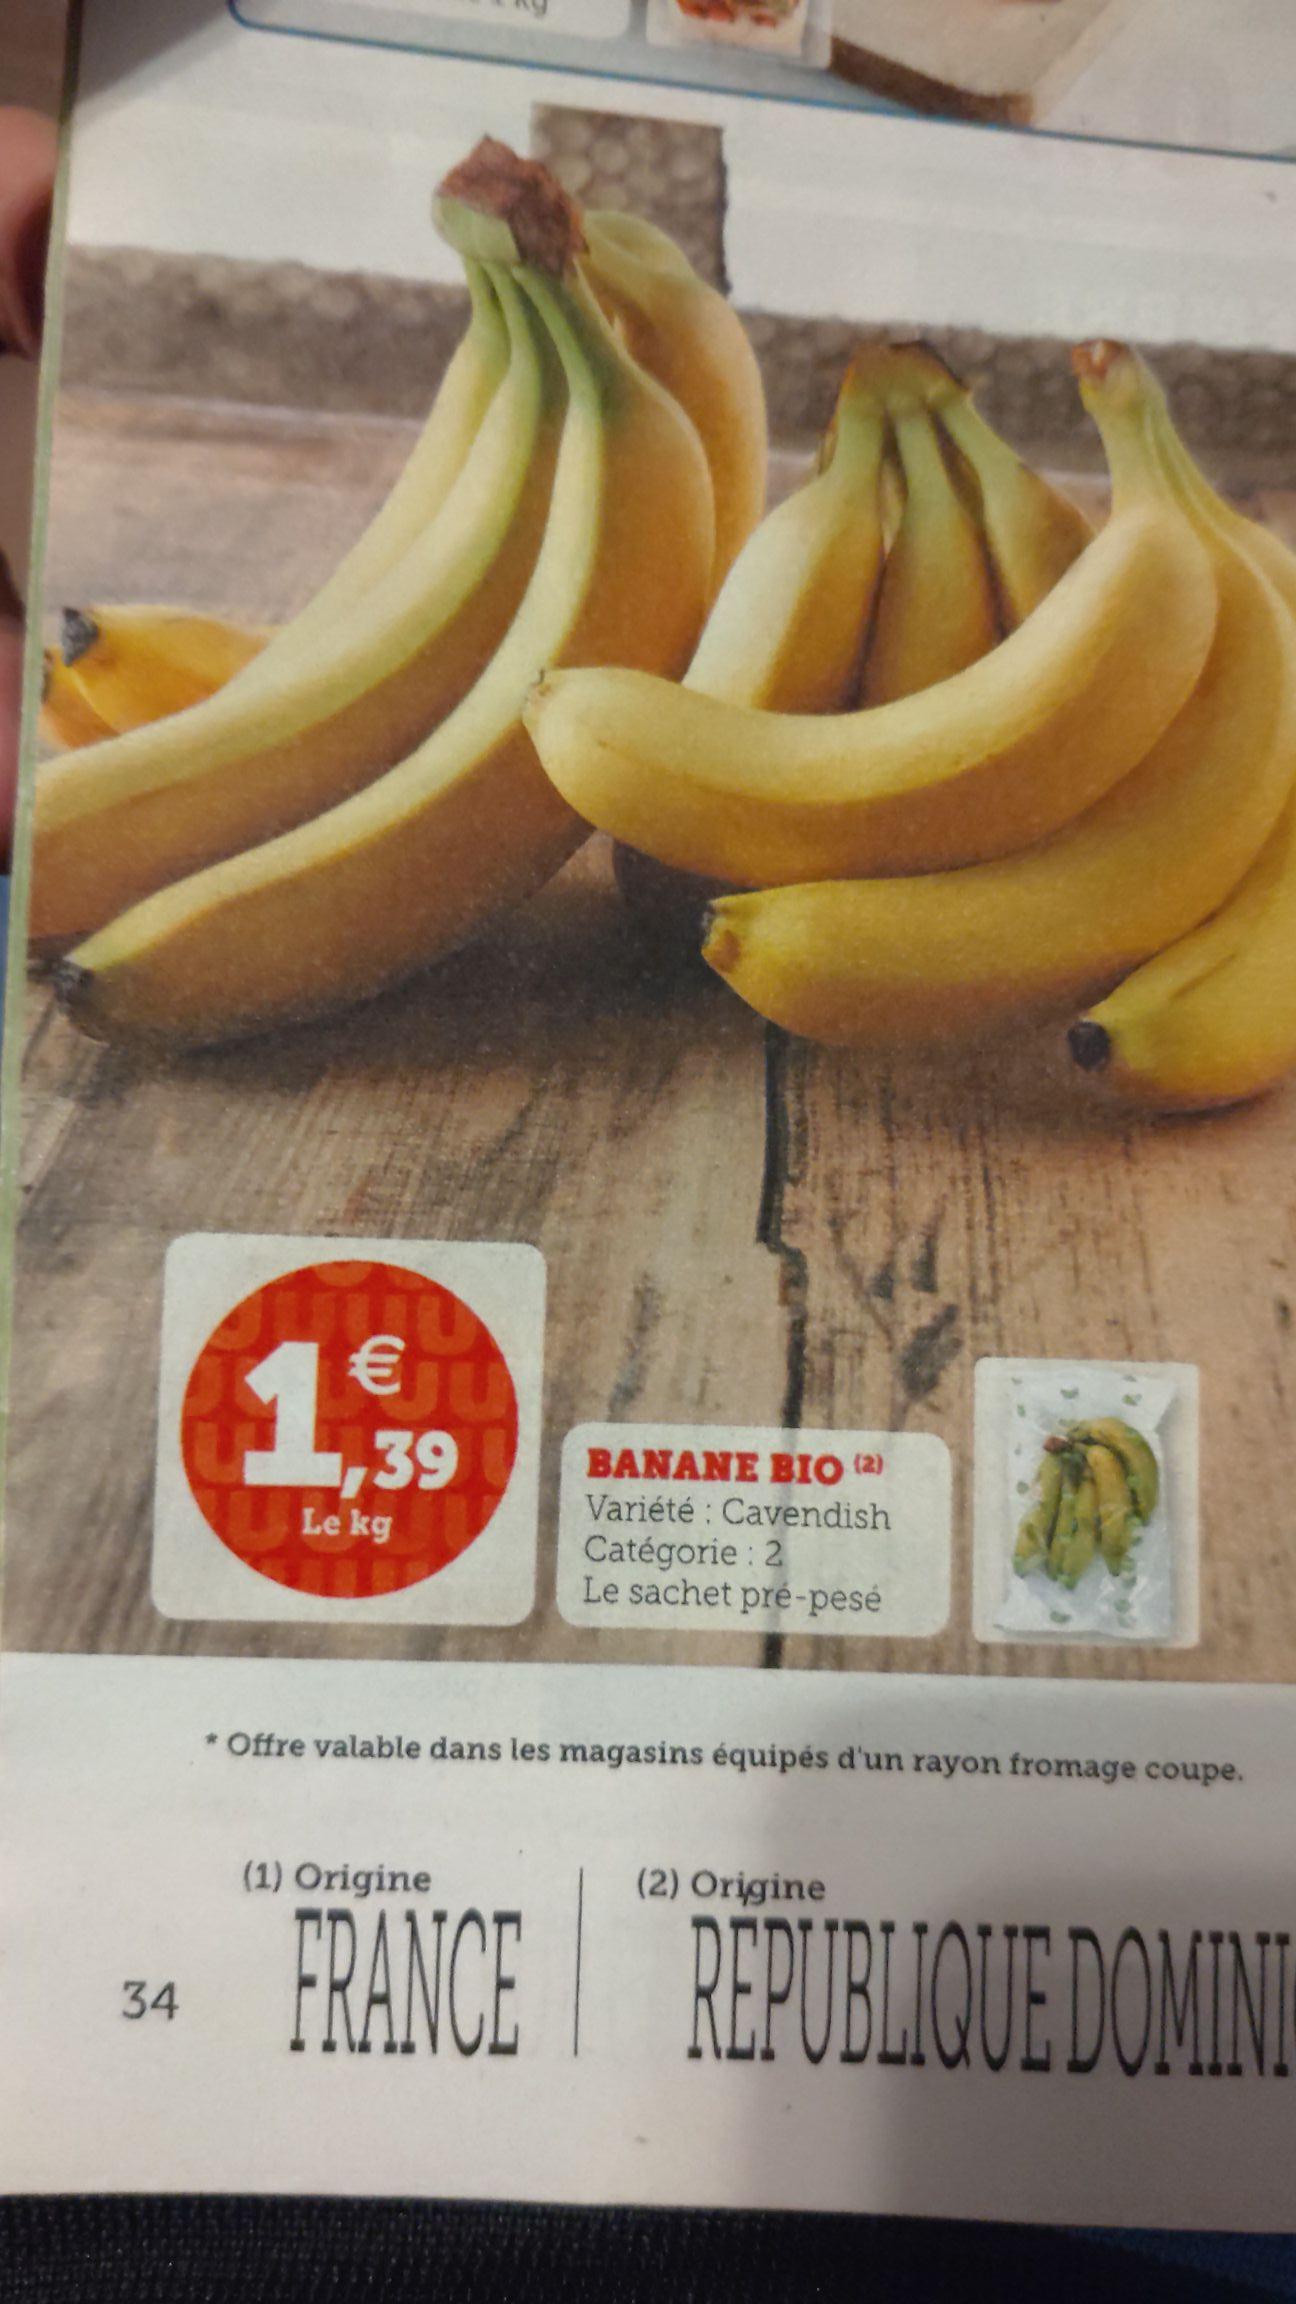 Bananes Bio Cavendish - Catégorie 2, 1 kg